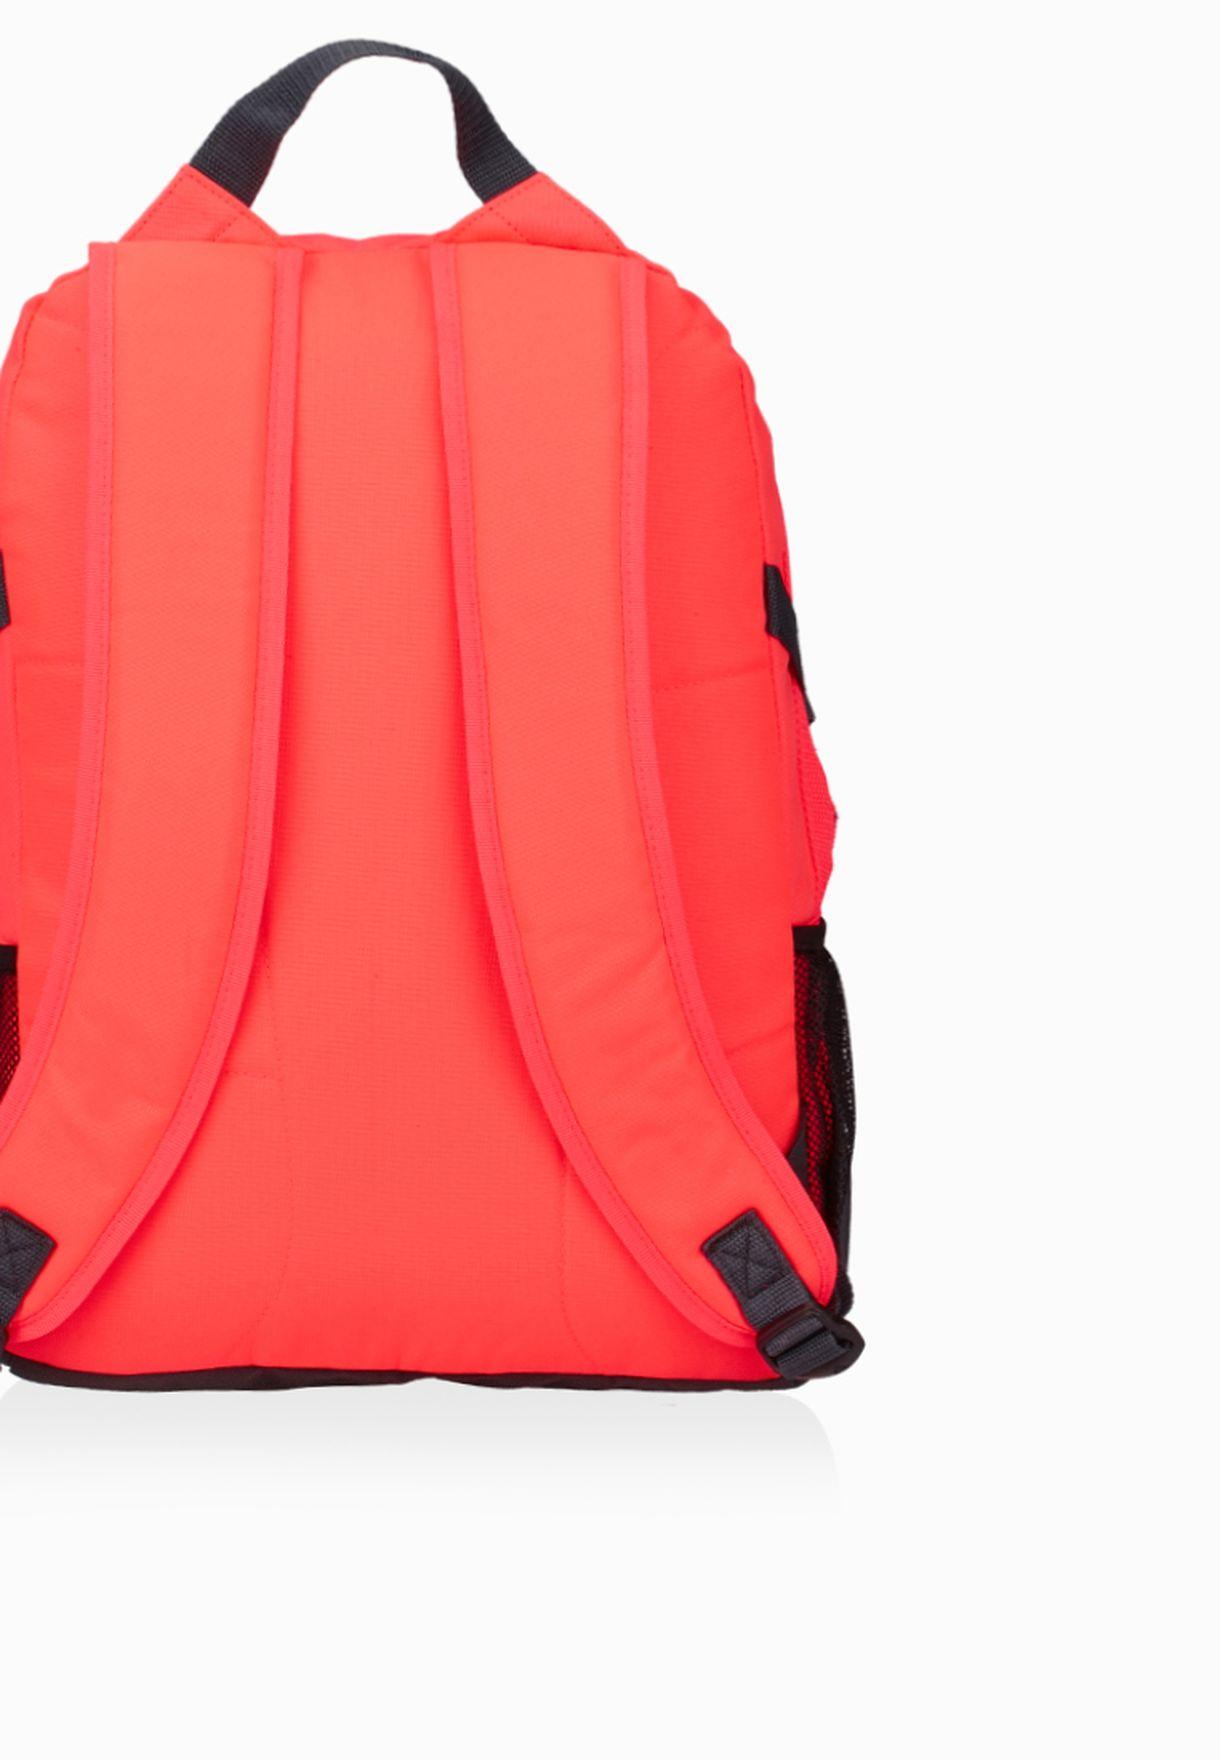 81cdadb8b8 Shop adidas pink BP Power II Backpack AB1709 for Women in UAE ...